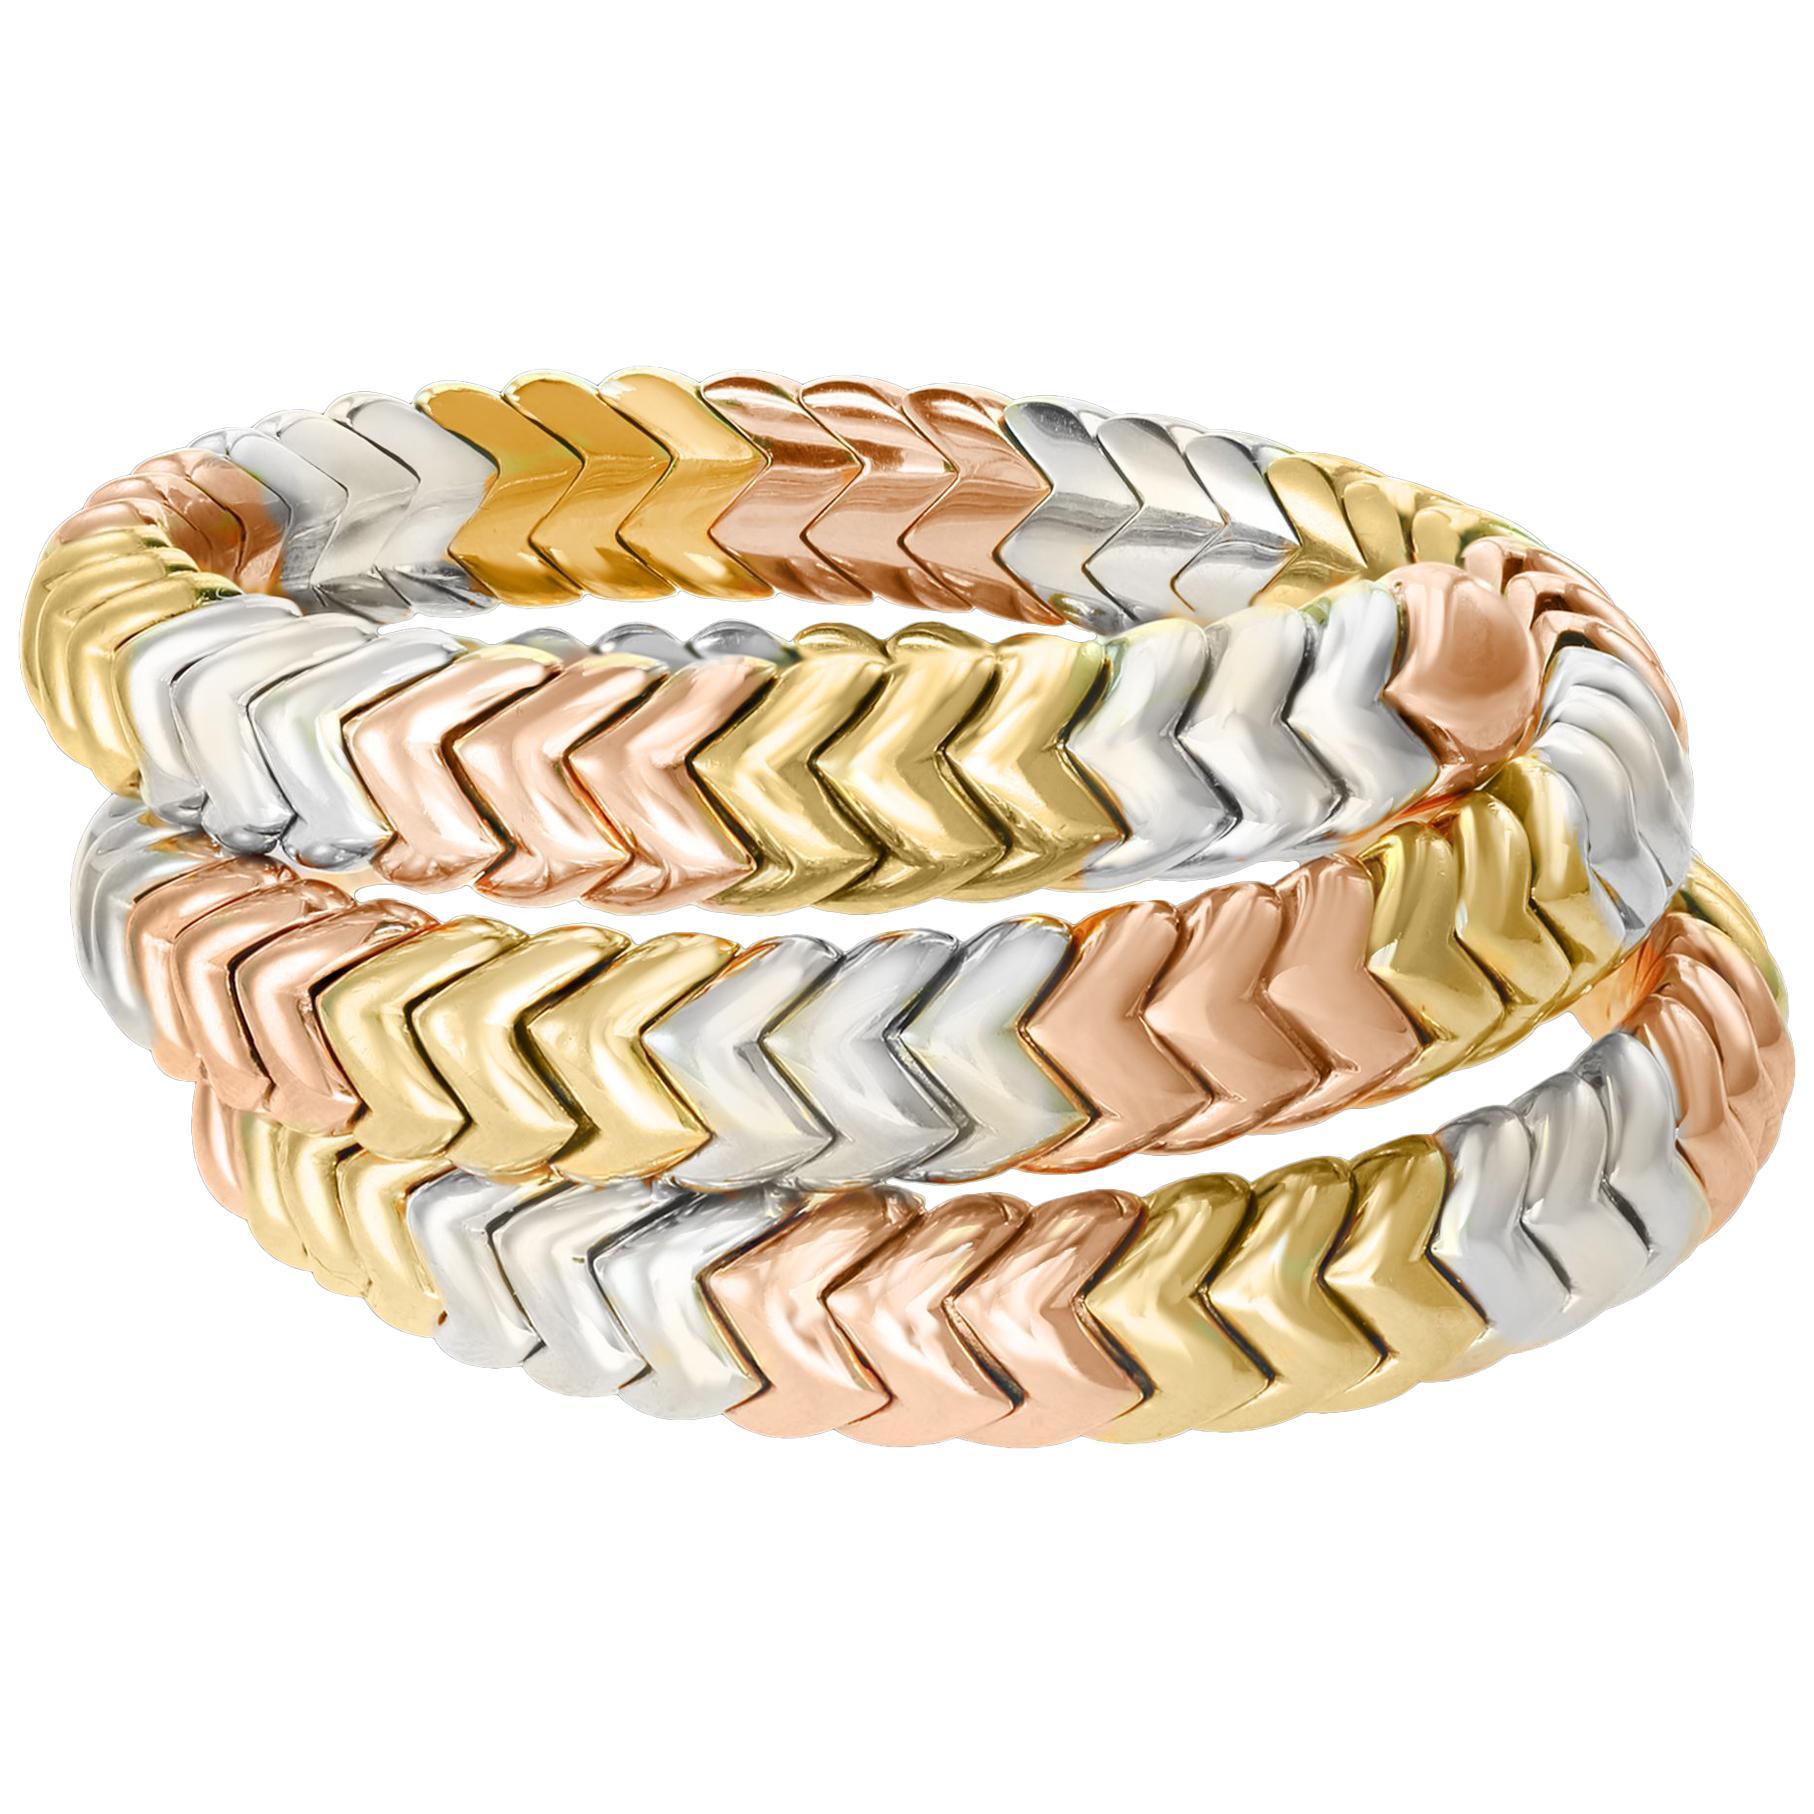 Bvlgari Serpenti 18 Karat Tri-Color Gold 92 Grams Bangle / Bracelet Designer